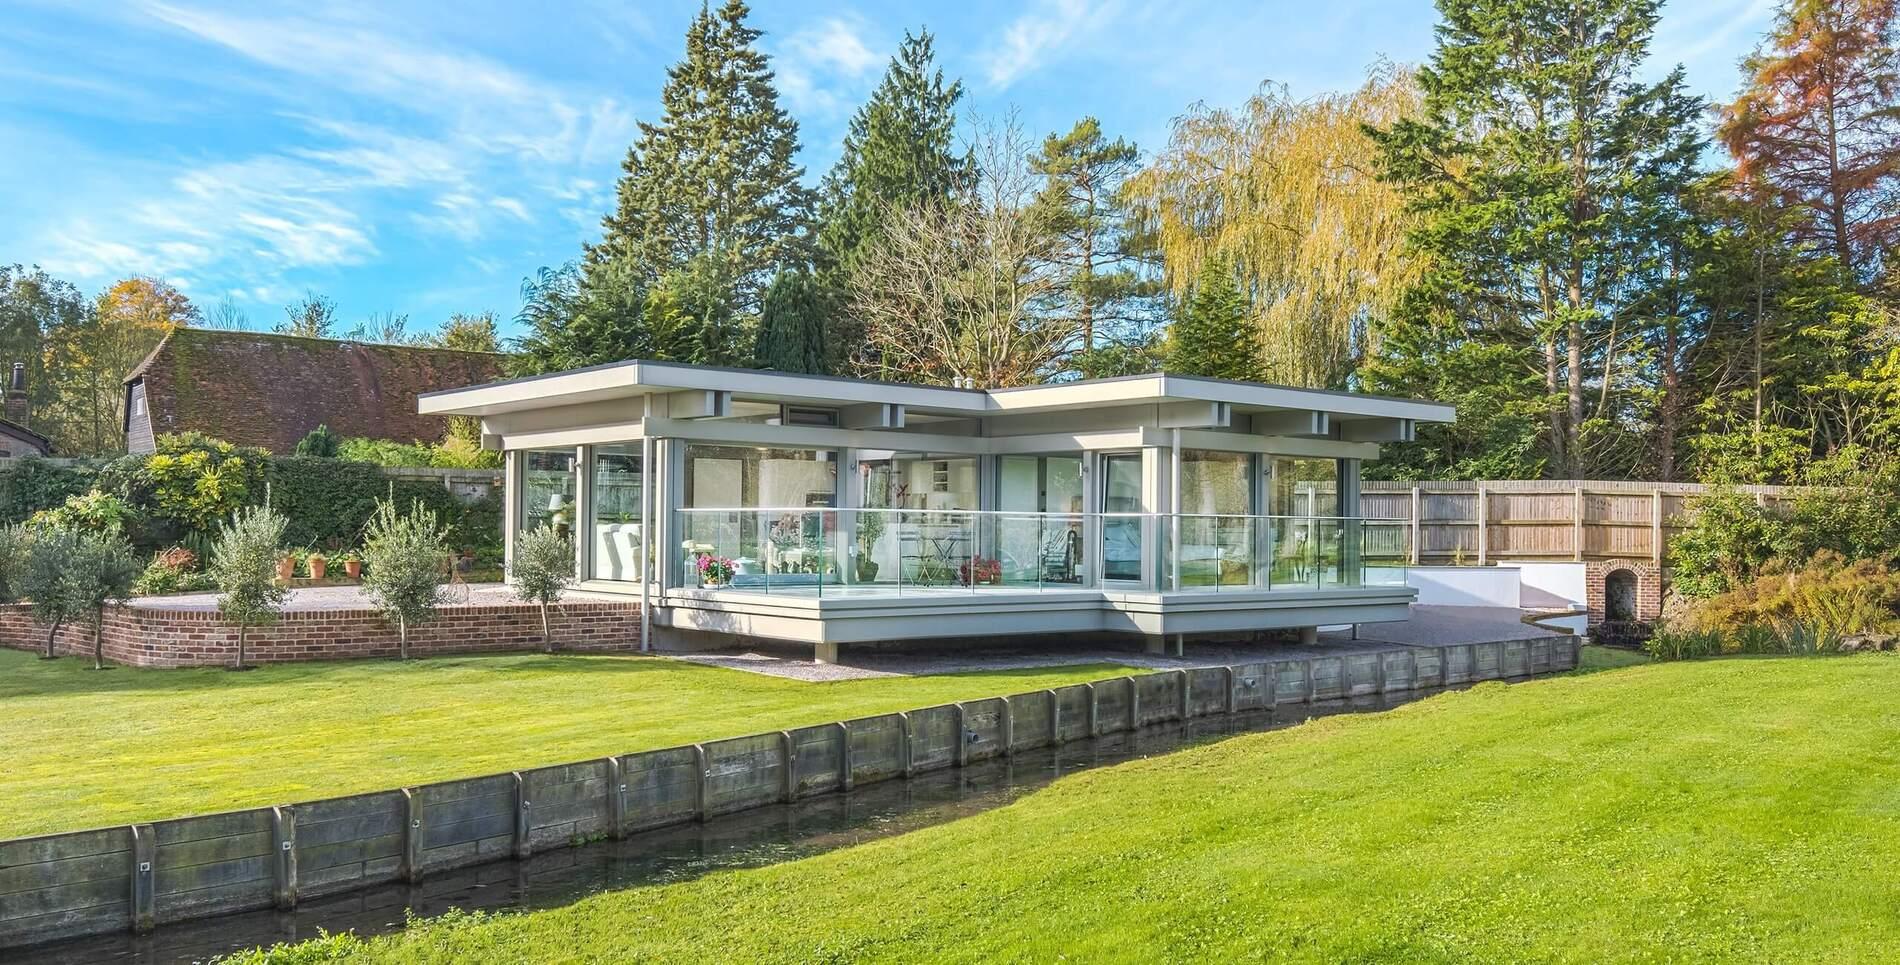 Flachdach Bauprojekt 5 Huf Haus